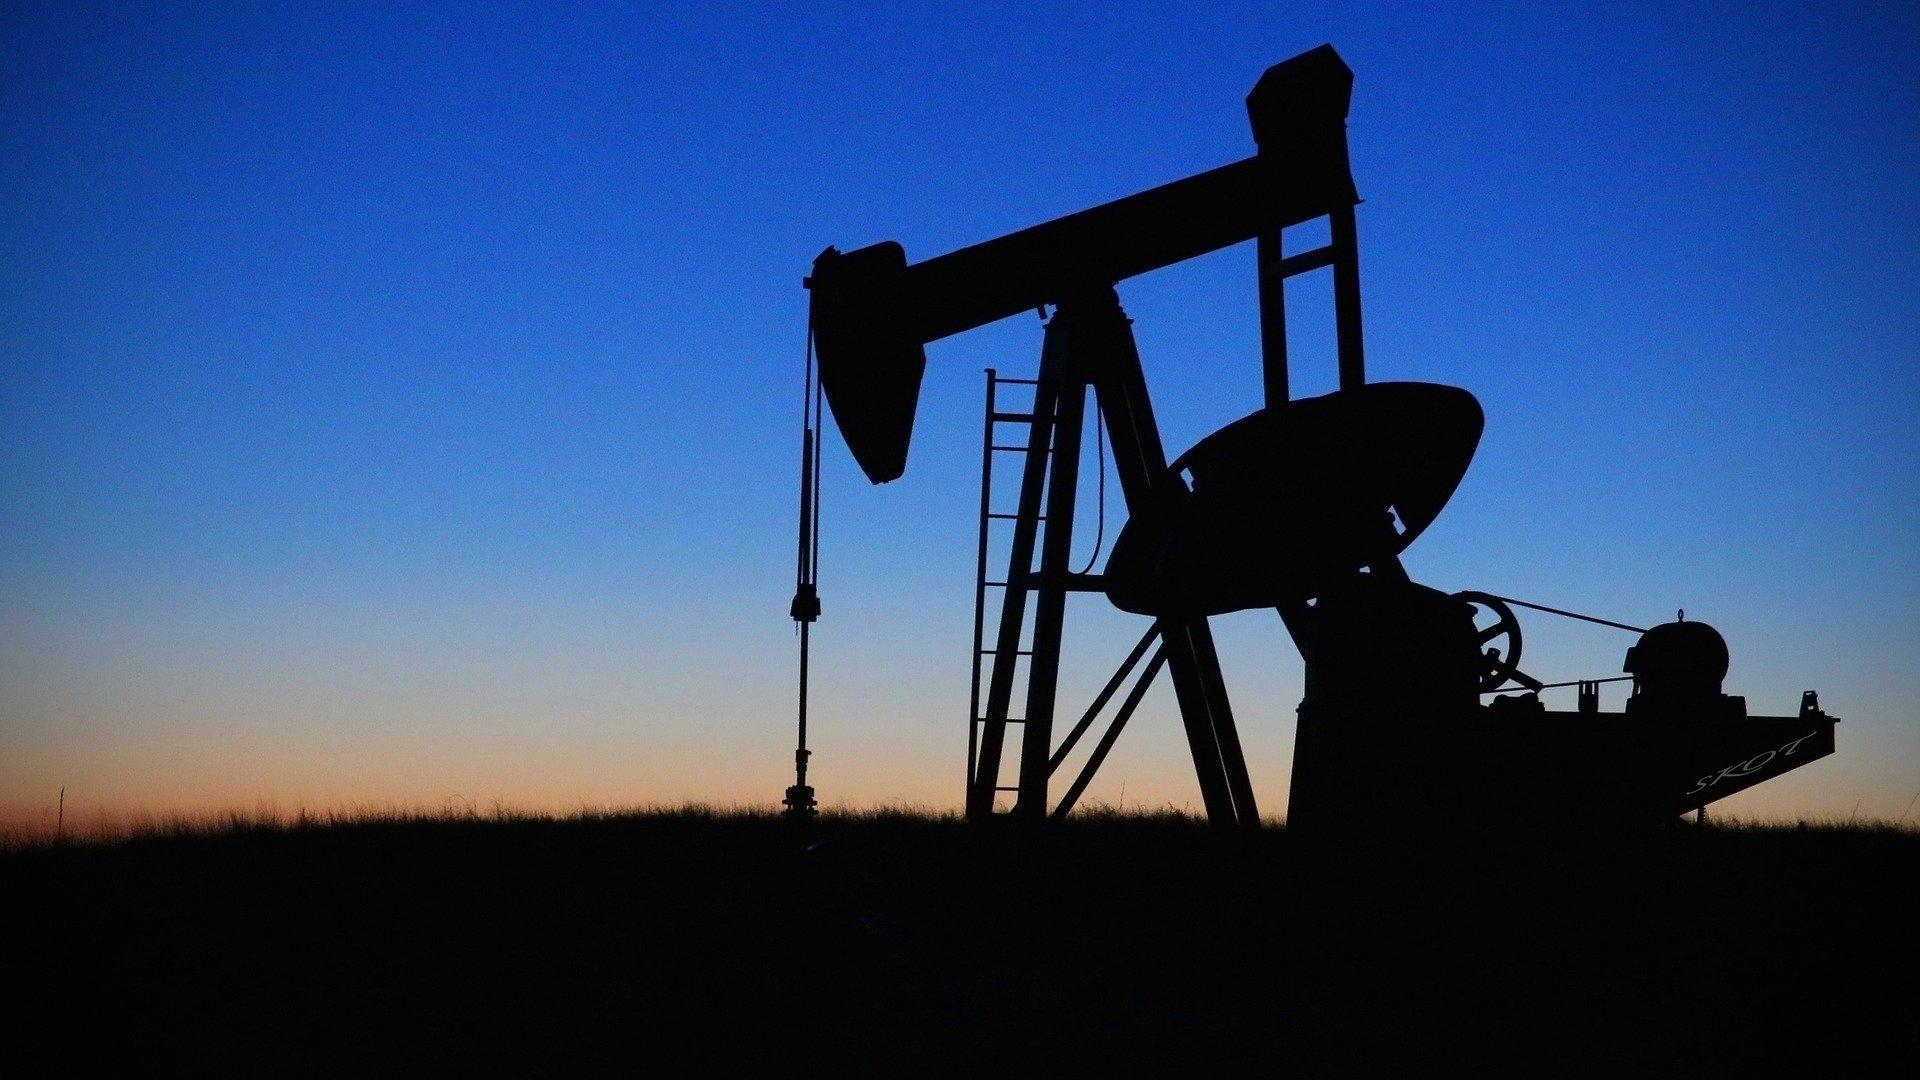 nigeria adopte enfin reforme loi petroliere 2008 - L'Energeek